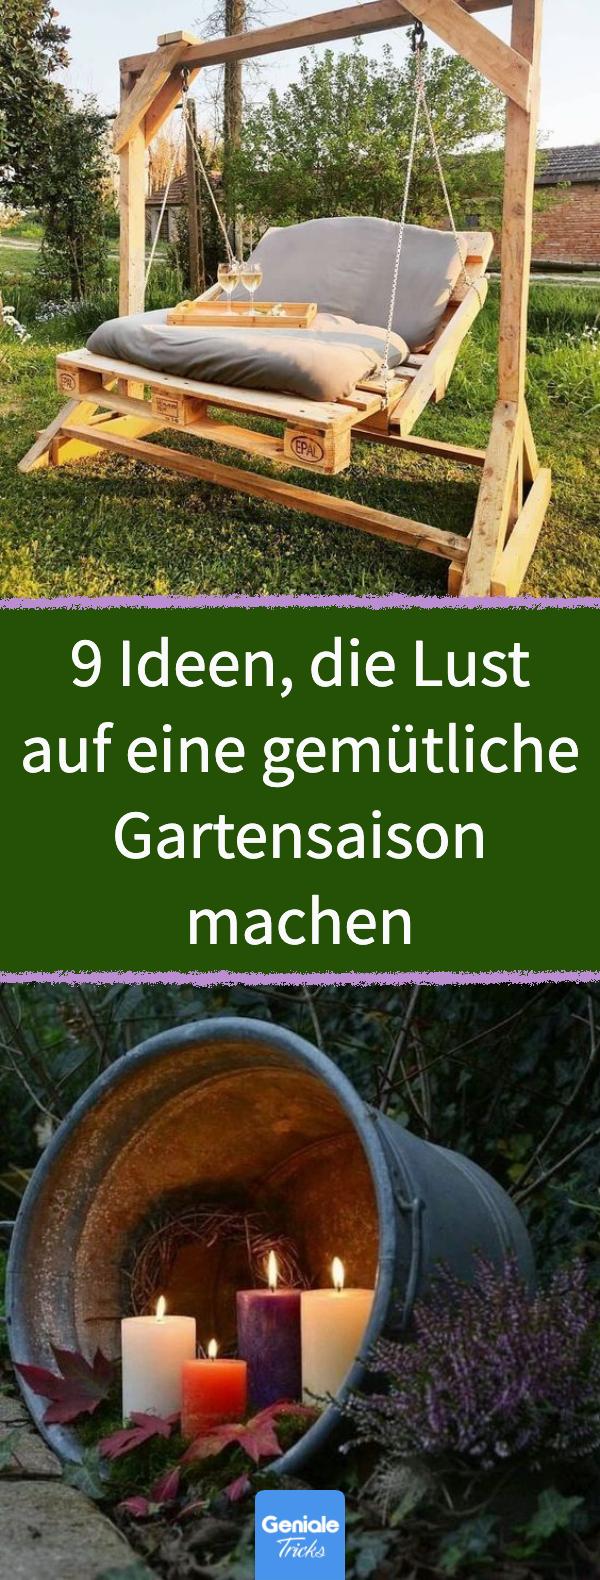 Garten gemütlich gestalten: 9 DIY-Ideen